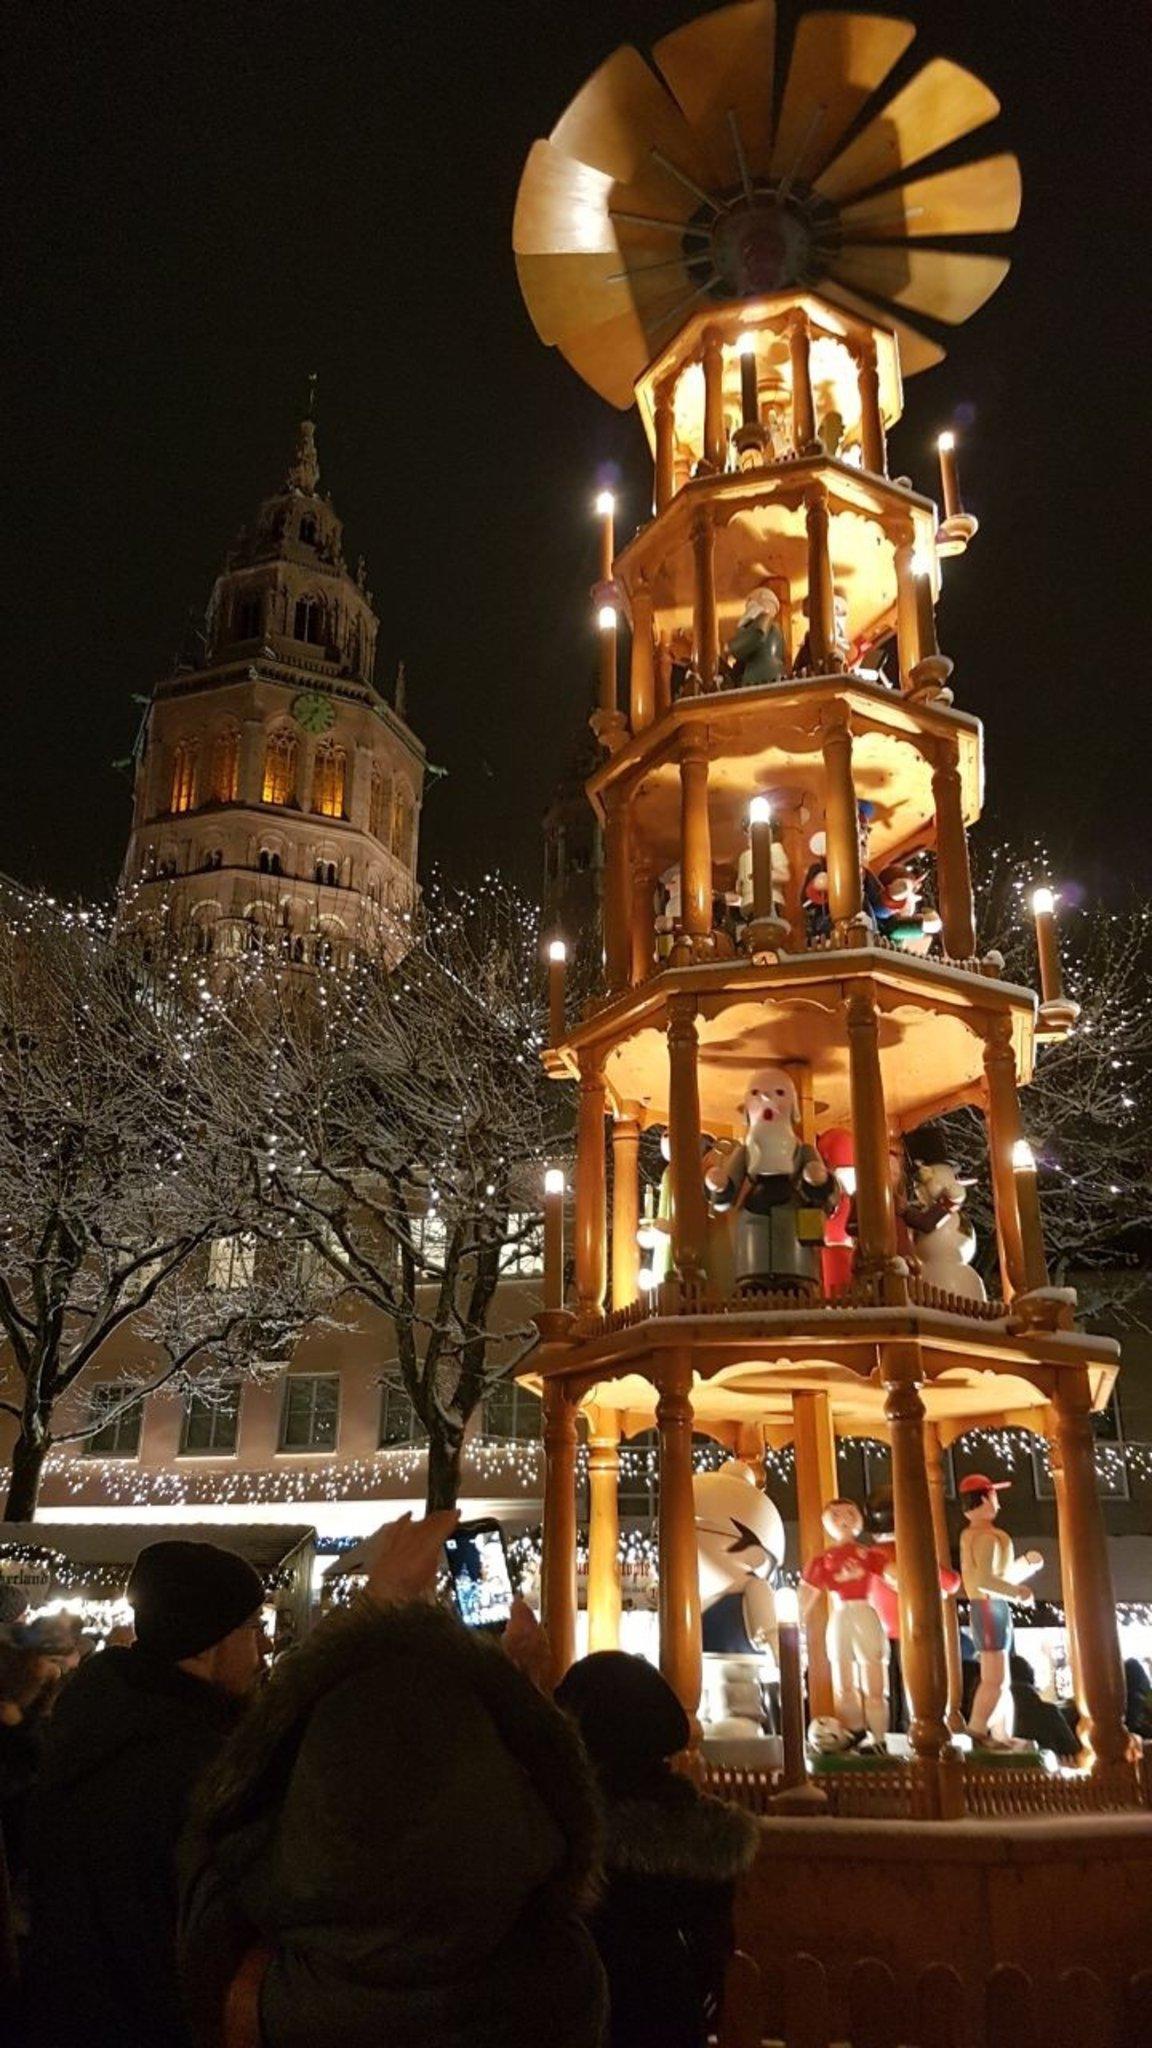 Weihnachtsmarkt Mainz.Weihnachtsmarkt Mainz